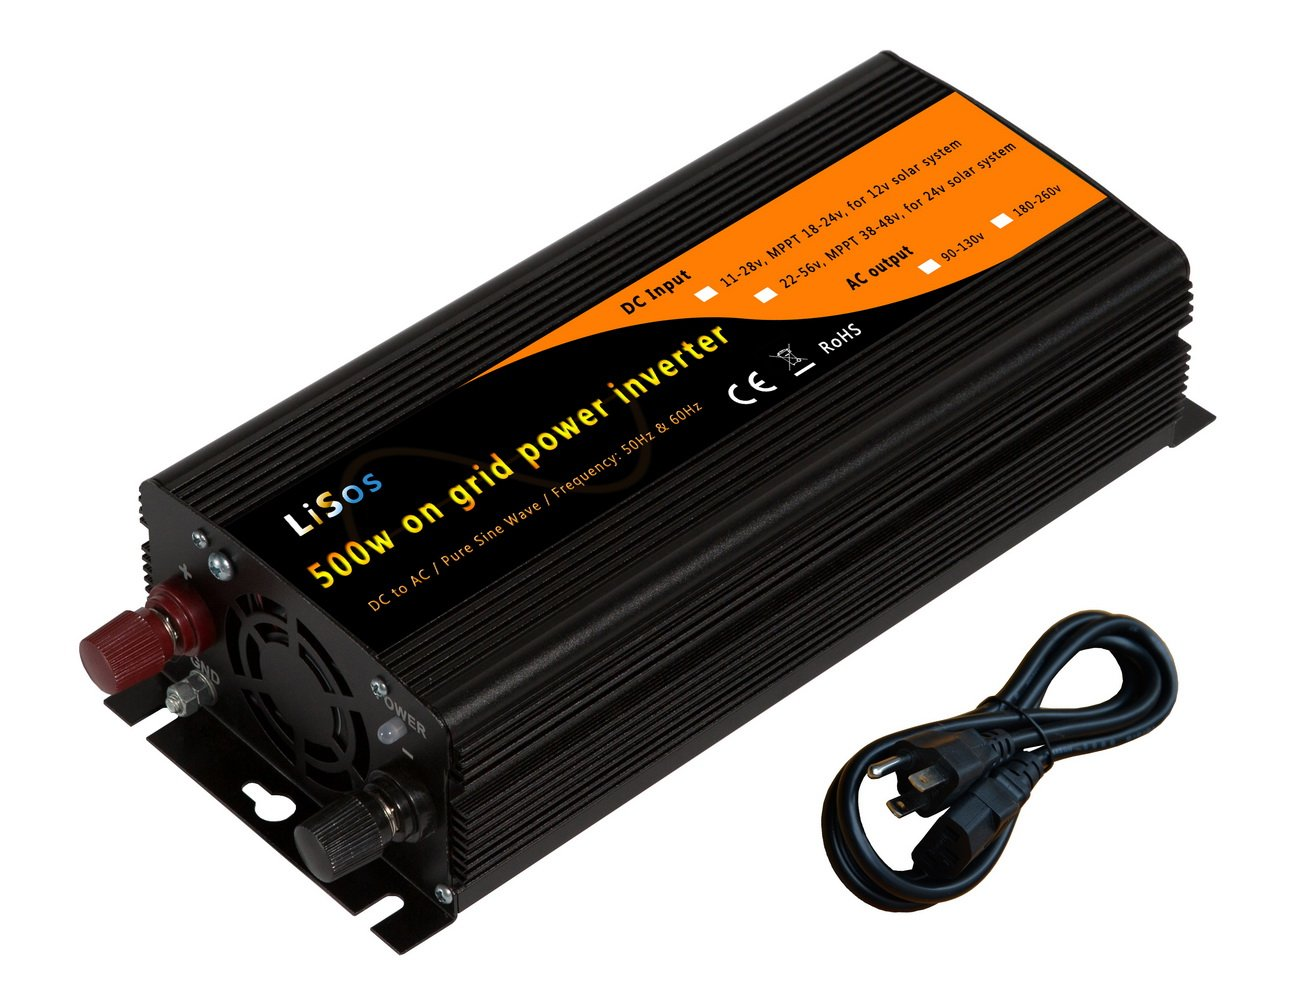 500w Solar Inverter Grid Tie Wiring Diagram Library 12 Volt To 220 Circuit Eleccircuitcom Amazoncom Power Pure Sine Wave Dc11 28v